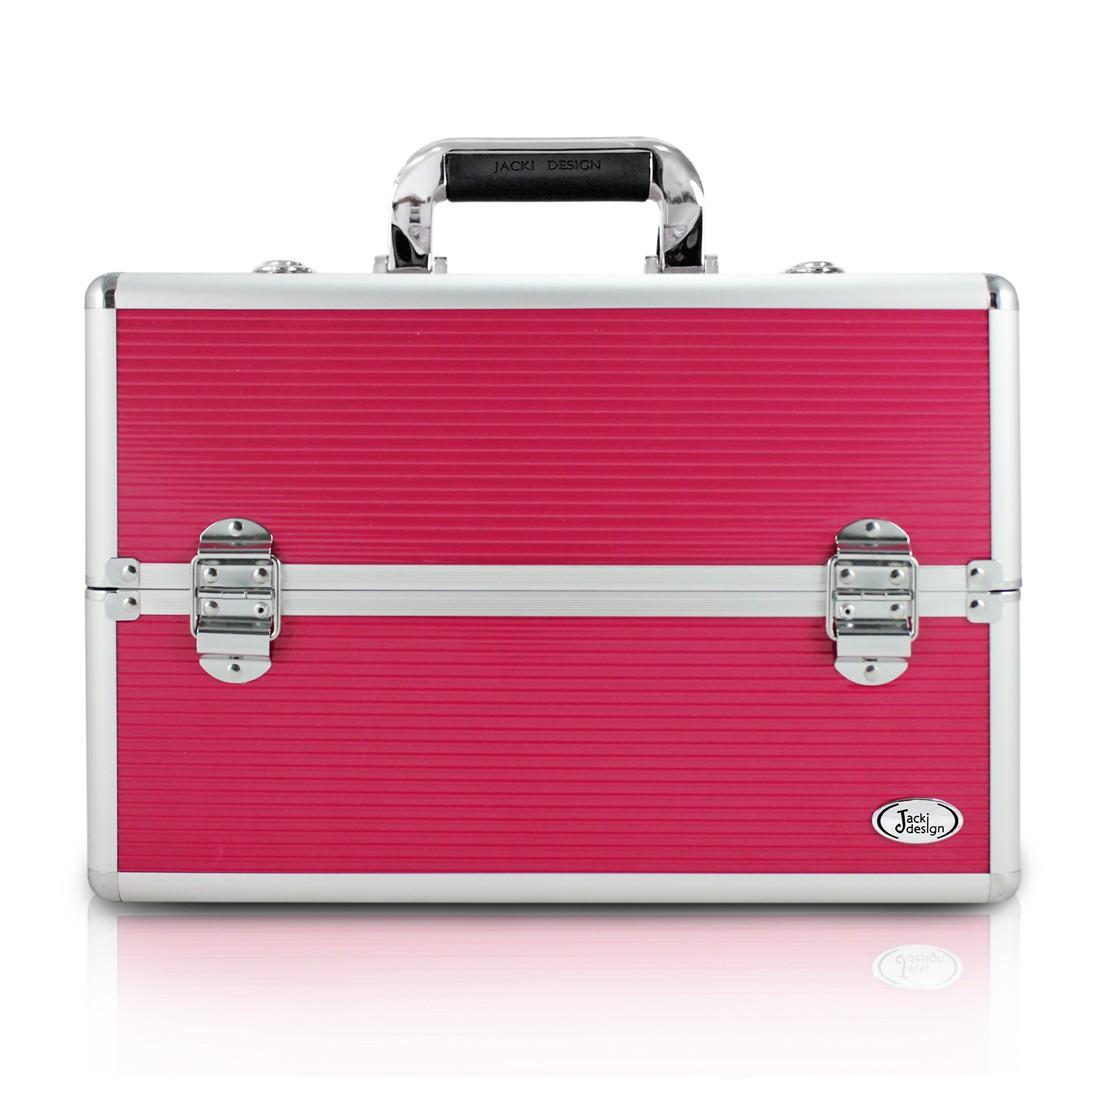 Maleta Profissional de Maquiagem Pink Jacki Design